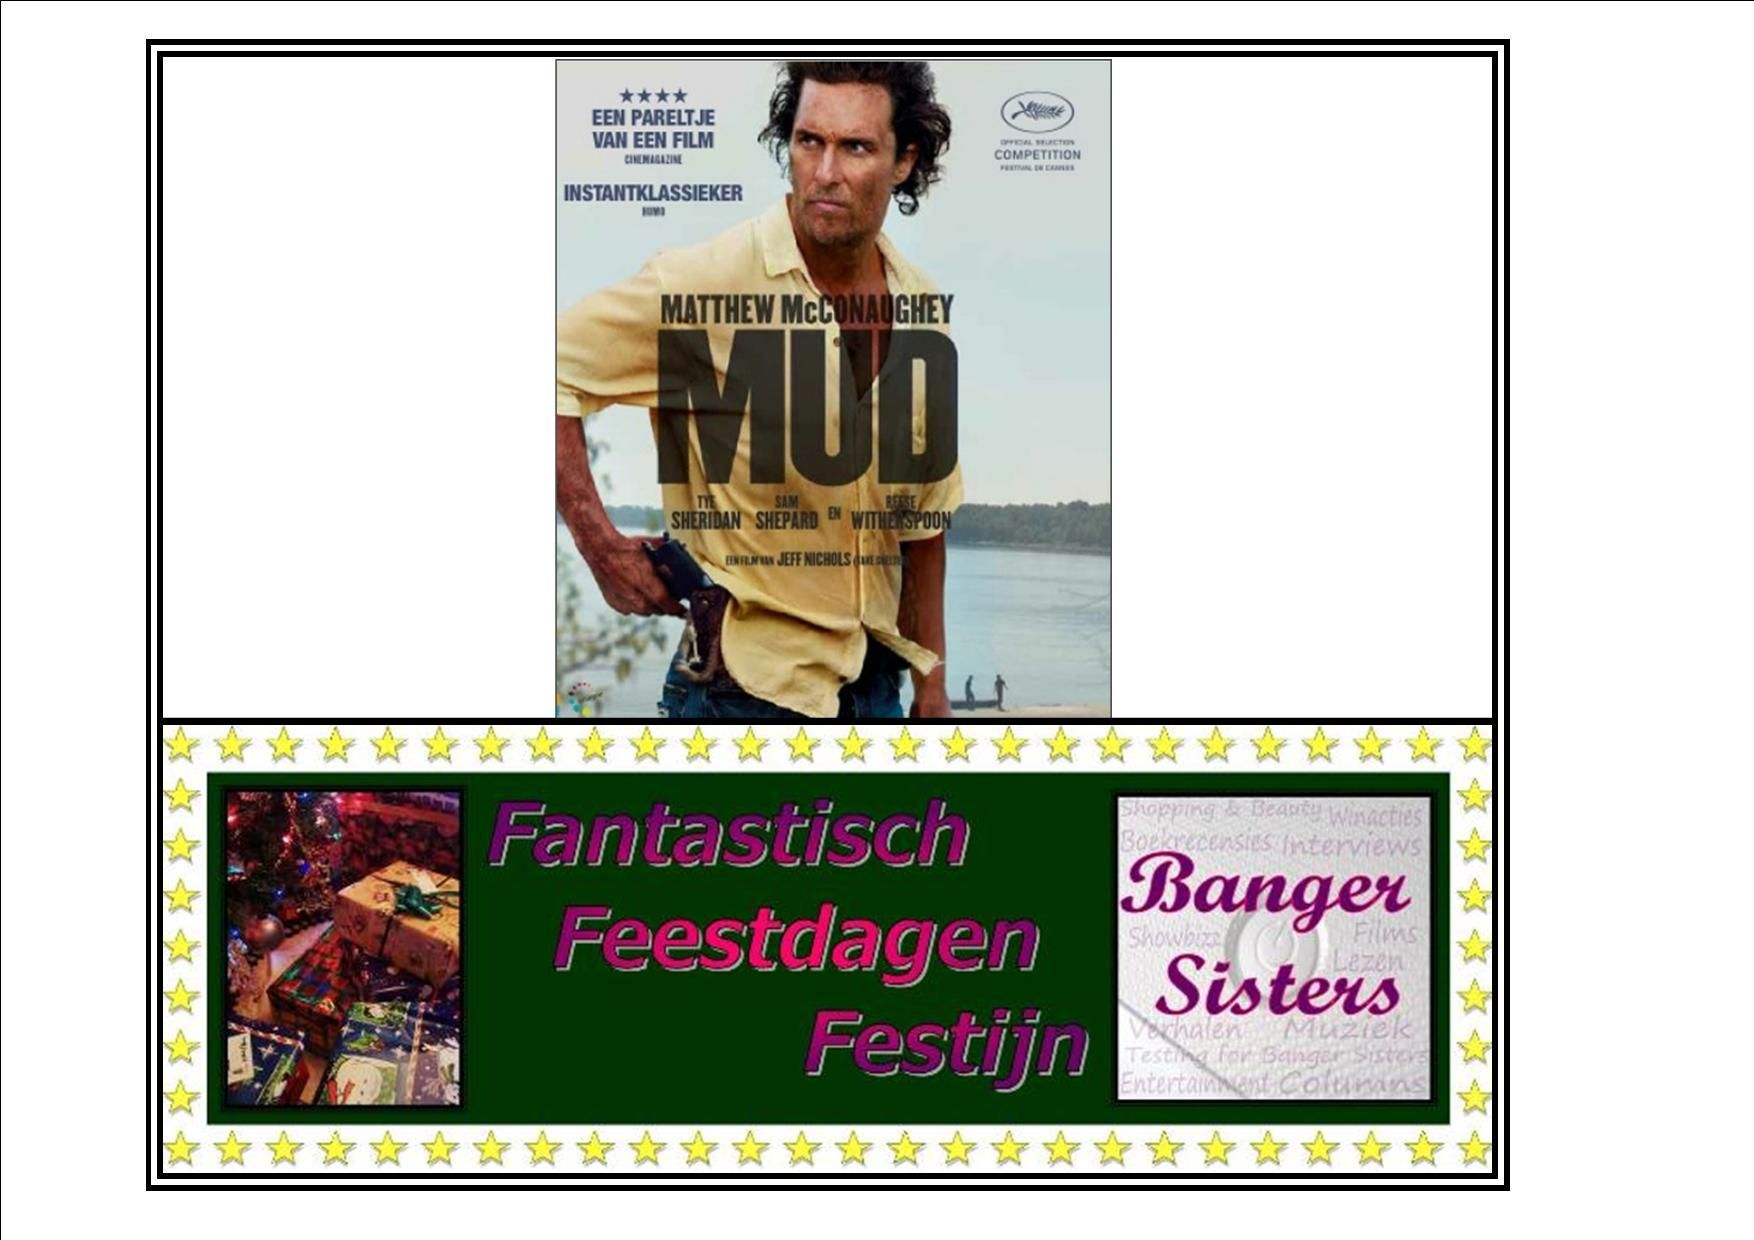 6. Fantastisch Feestdagen Festijn- Win de dvd film Mud!